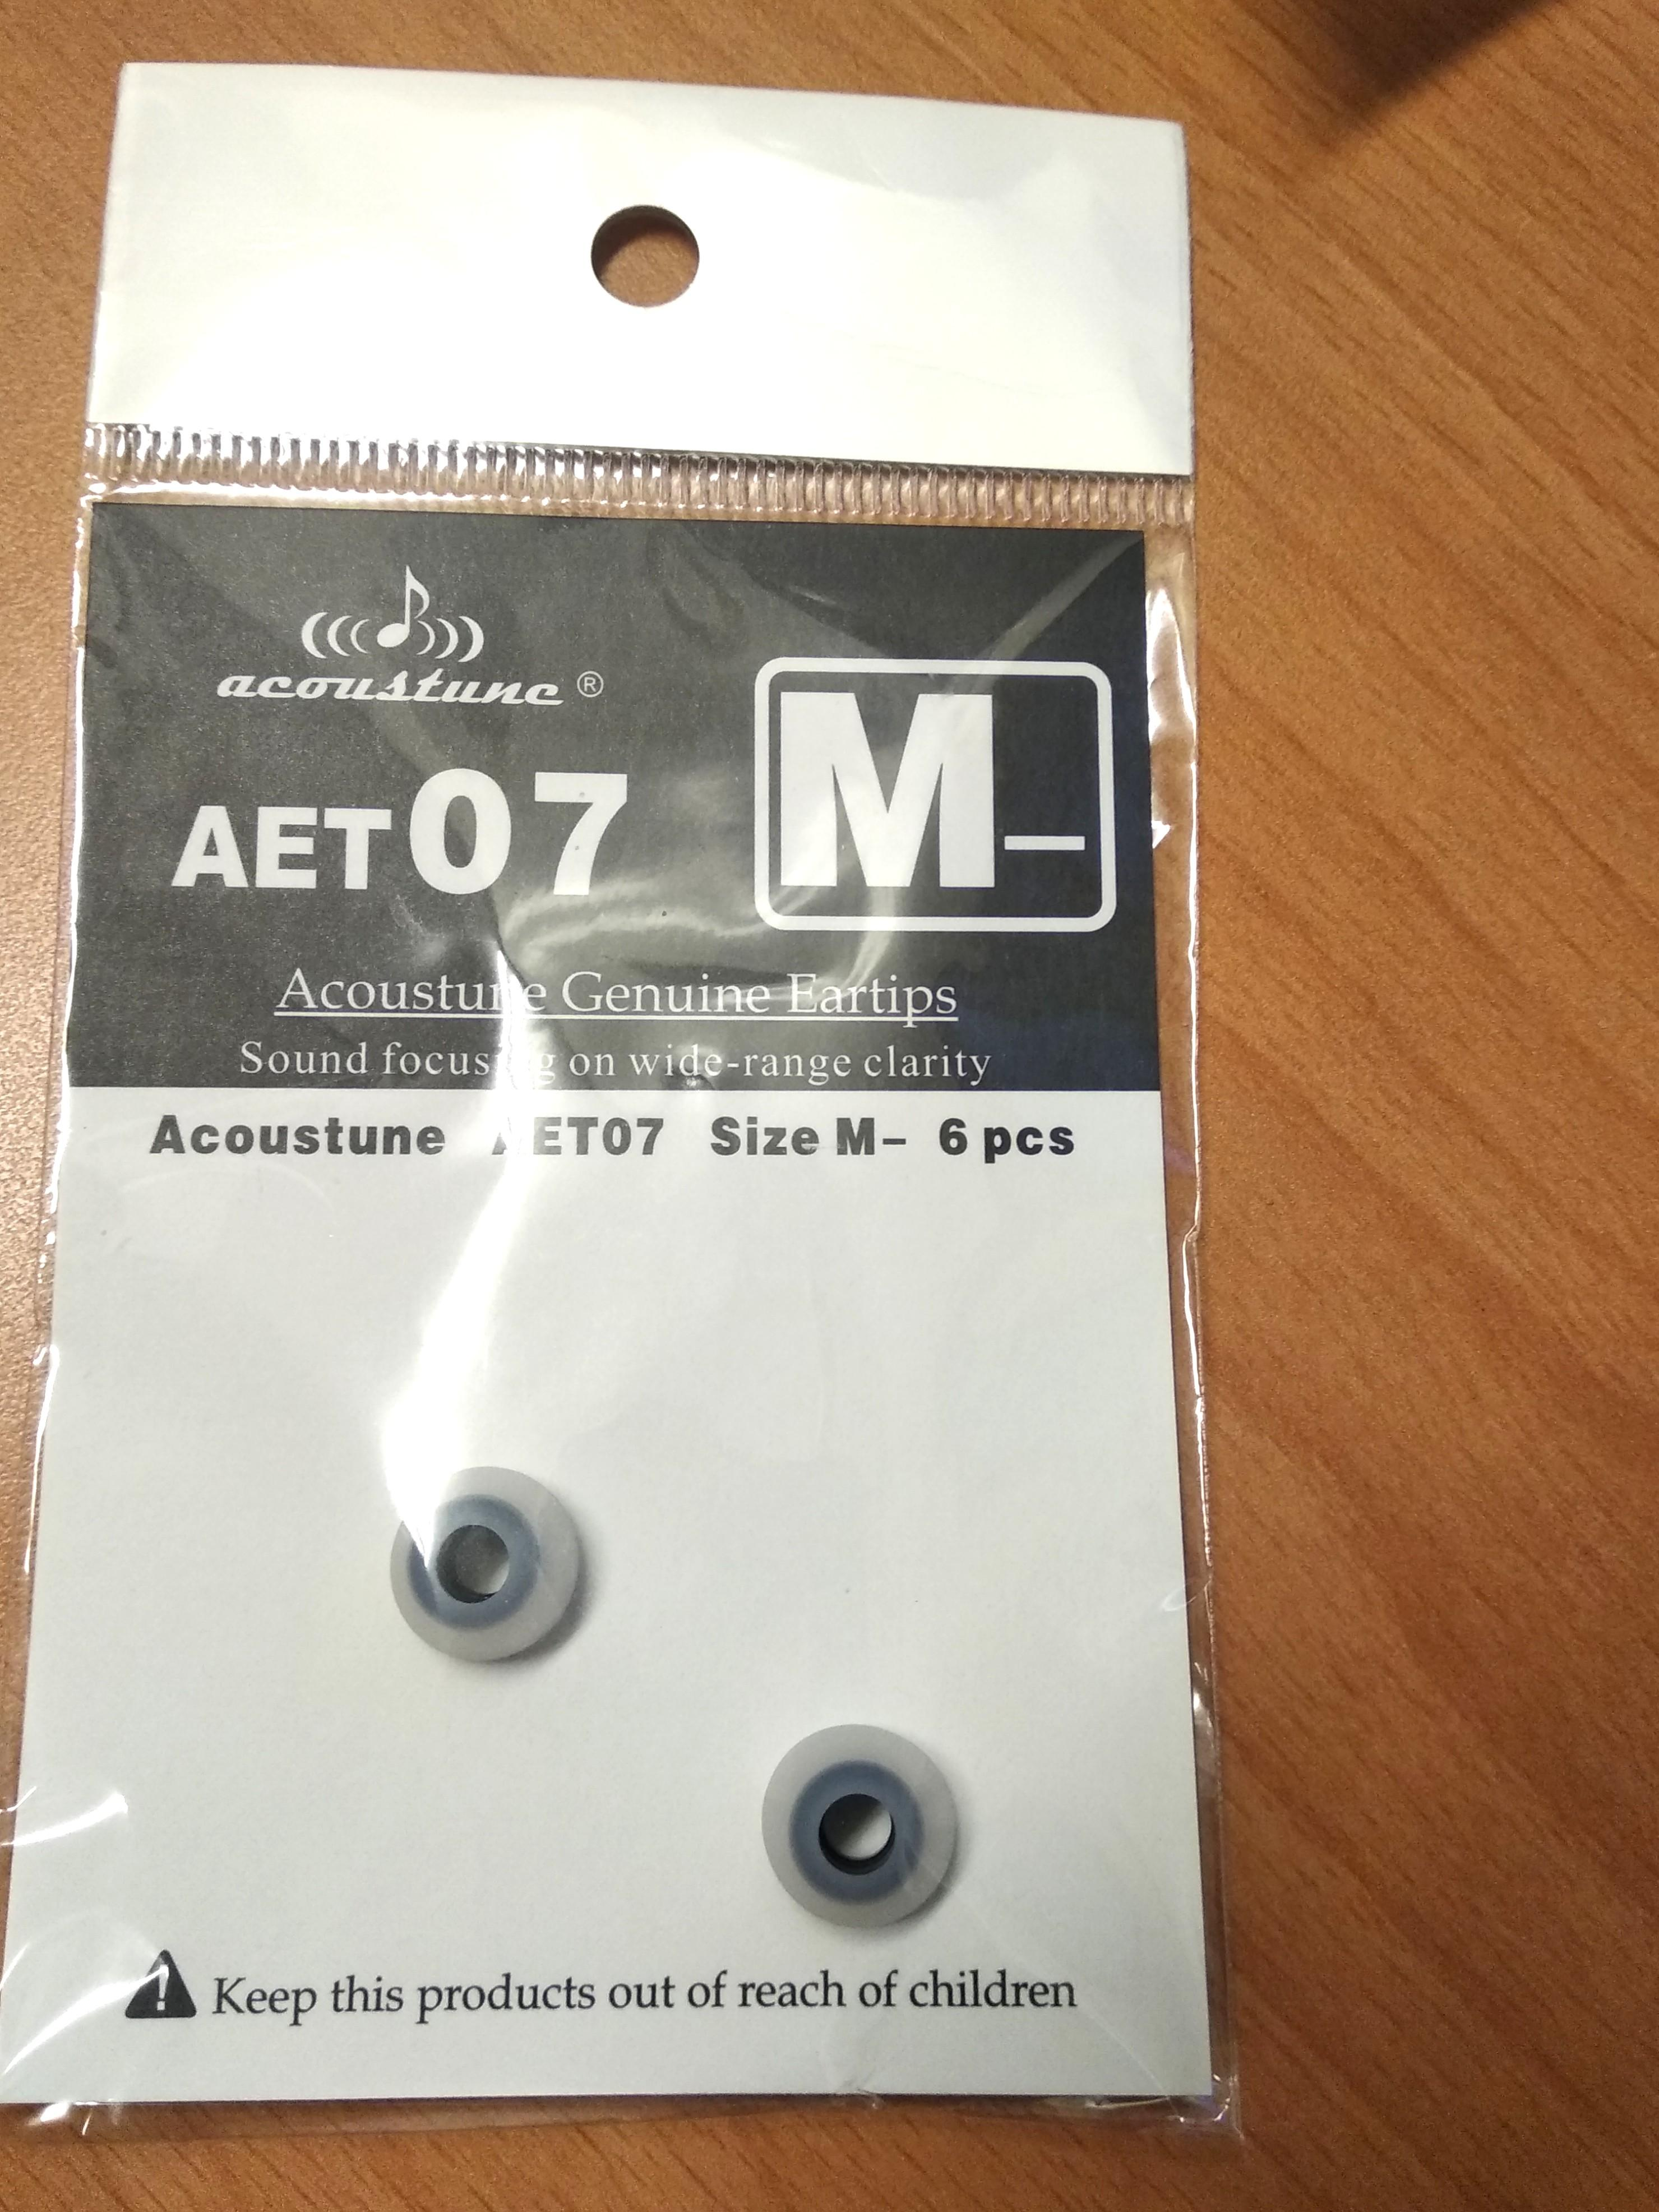 Acoustune AET07 M-號 耳機耳塞一對